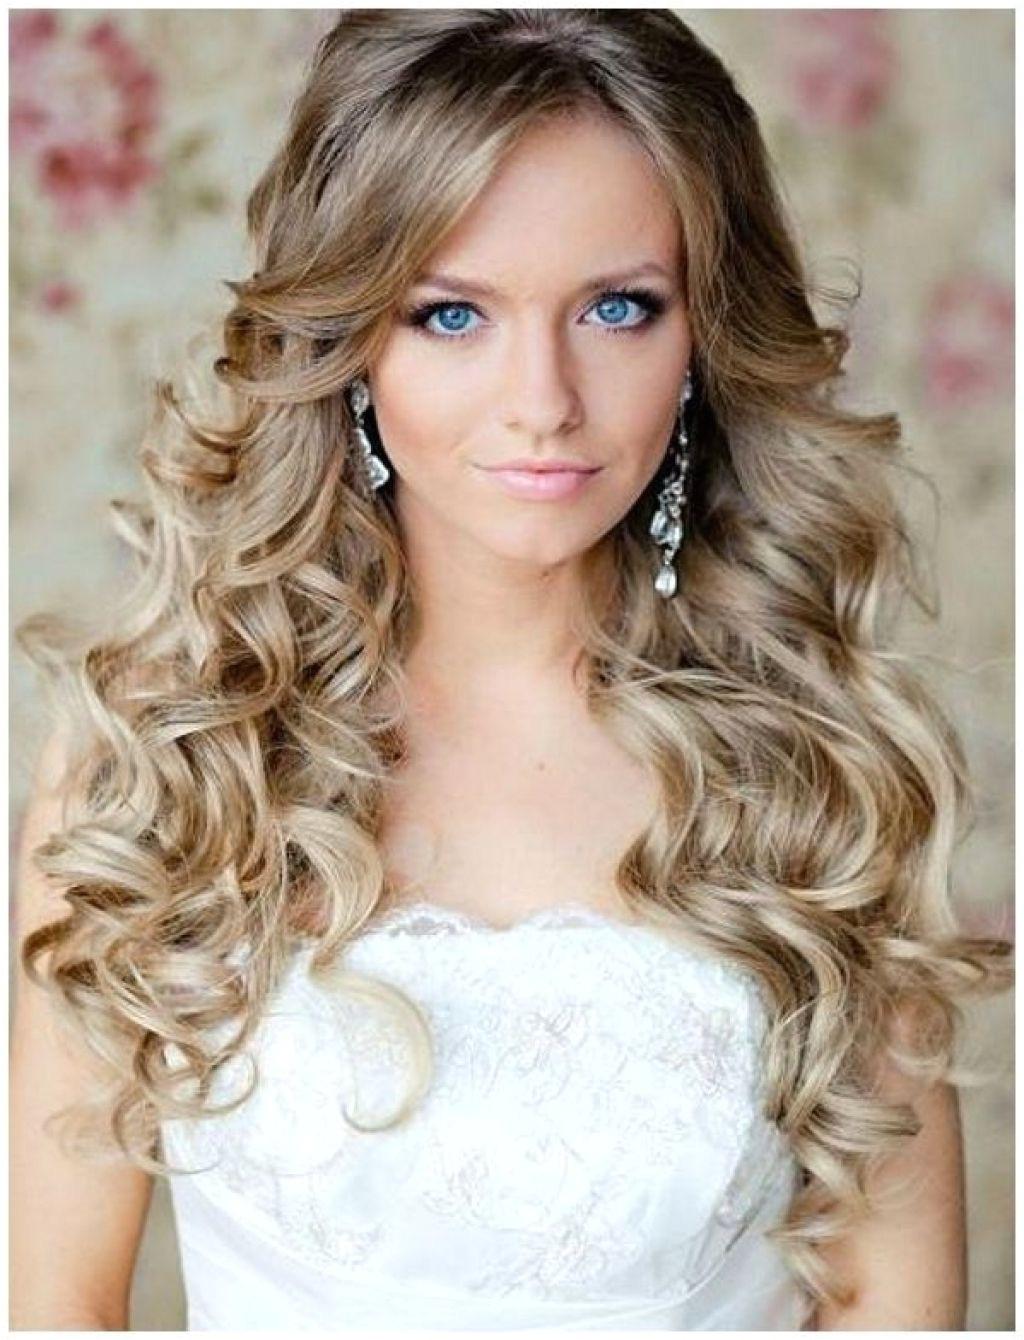 Wedding Hairstyles Down Simple Wedding Guest Hairstyles with Bangs Simple Wedding Hairstyles Simple